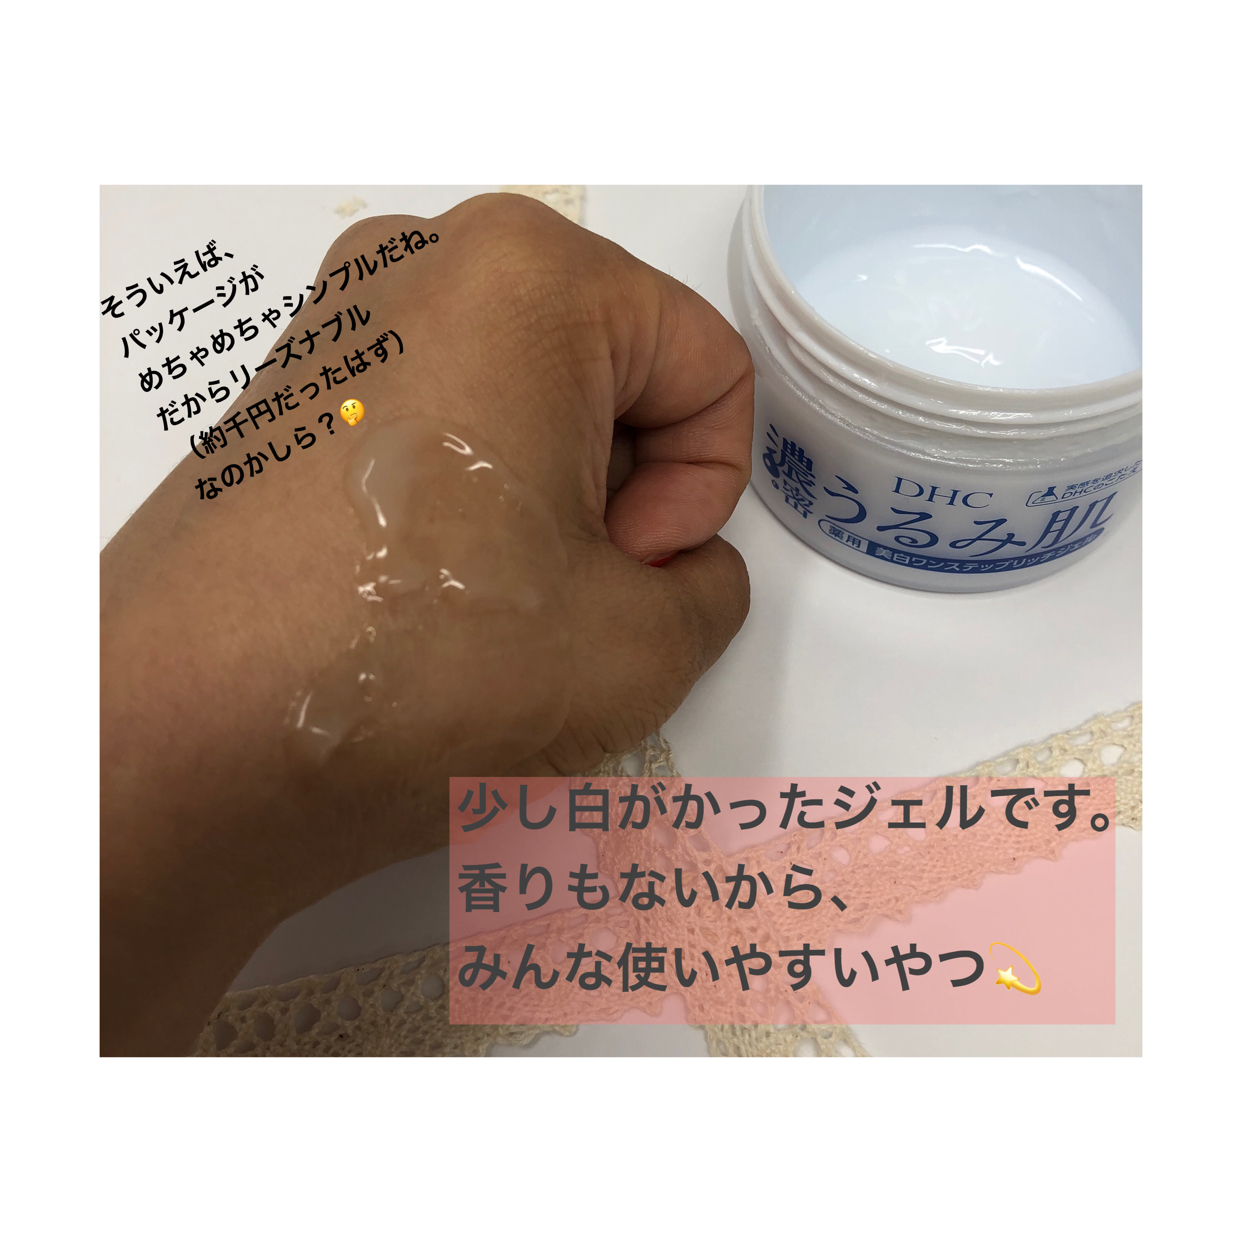 DHC DHC濃密うるみ肌 薬用美白ワンステップリッチジェル(医薬部外品)(フェイスクリーム・スキンケアクリーム)を使ったクチコミ(3枚目)